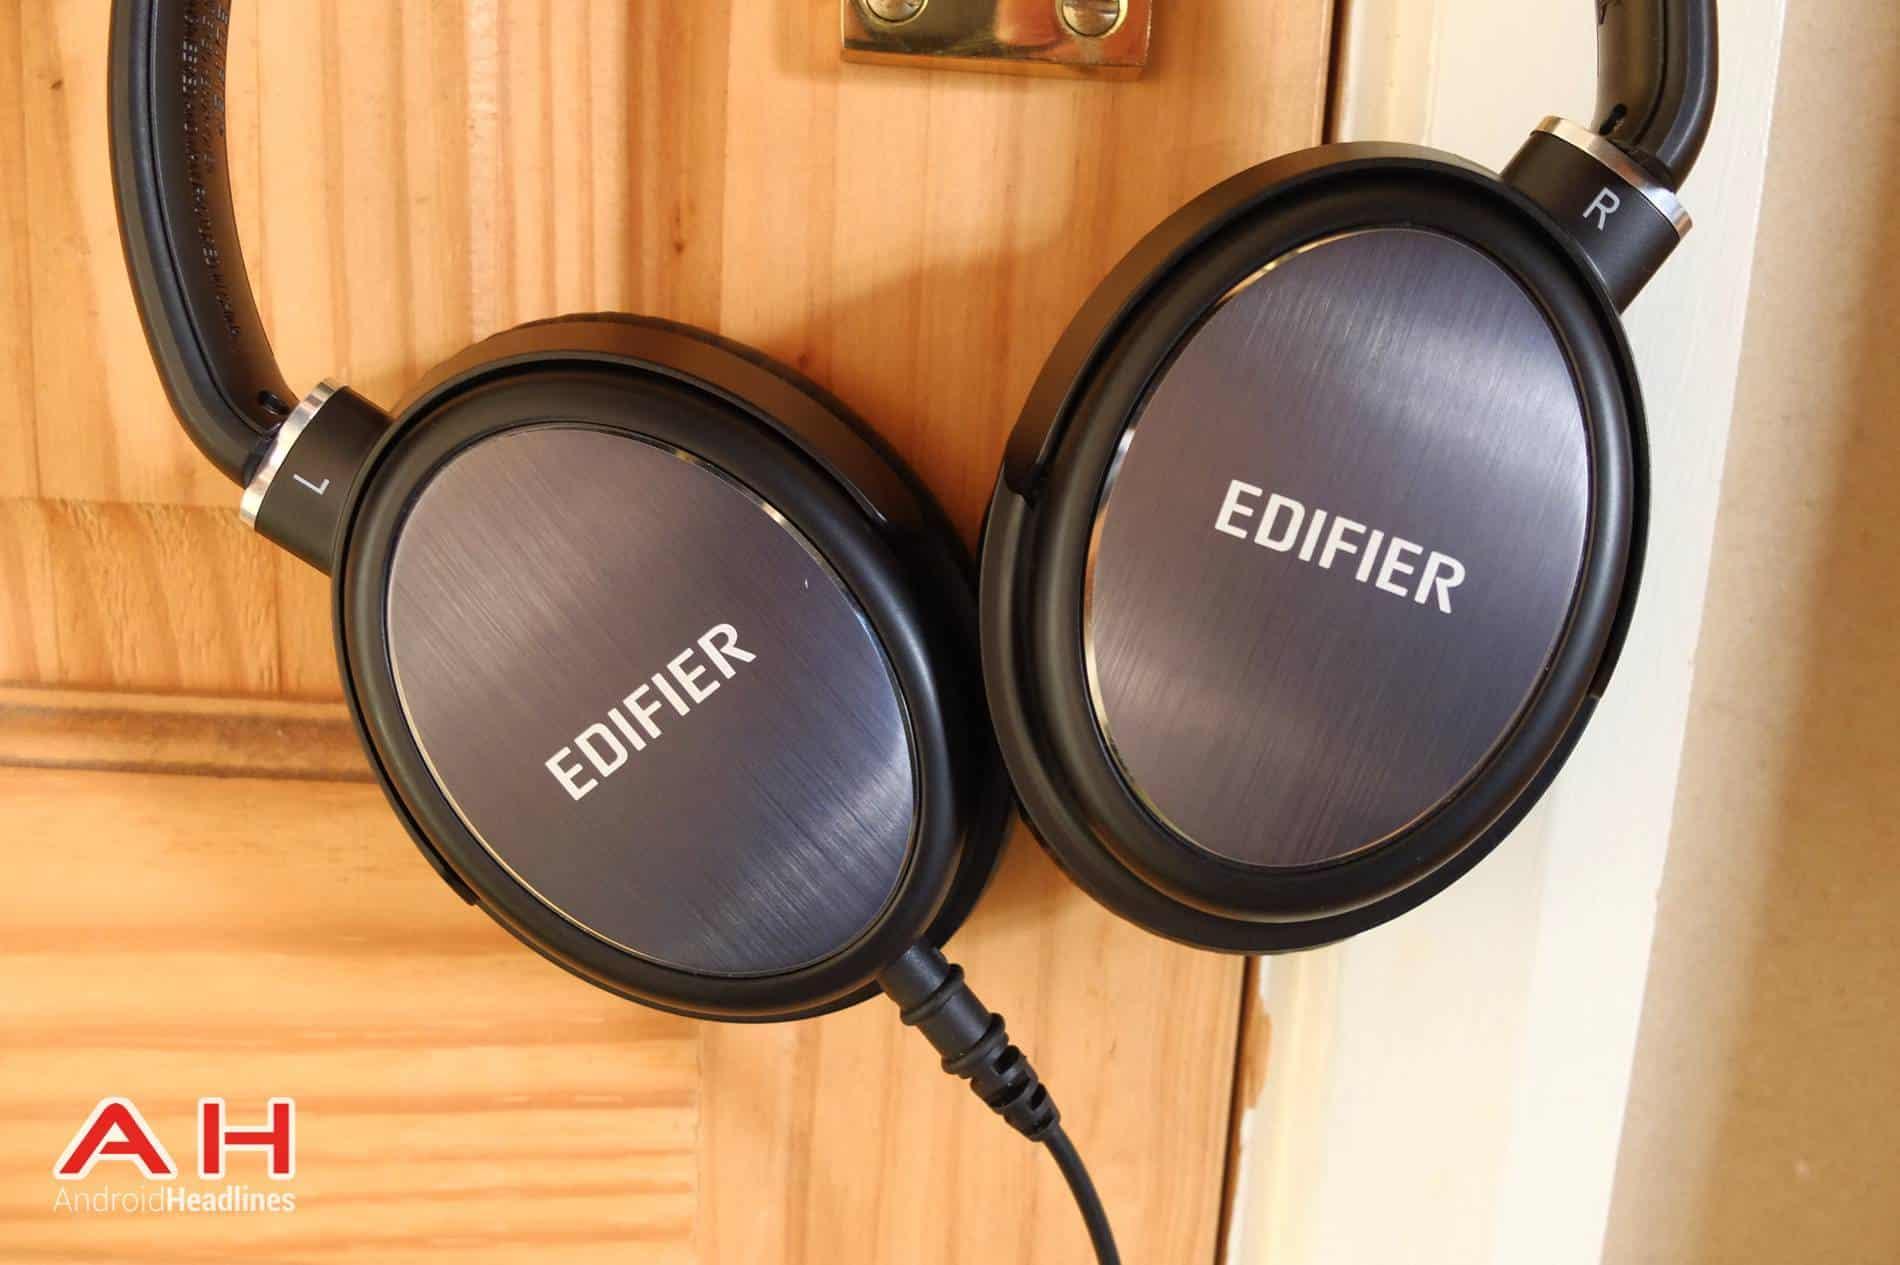 Edifier H850 AH 06